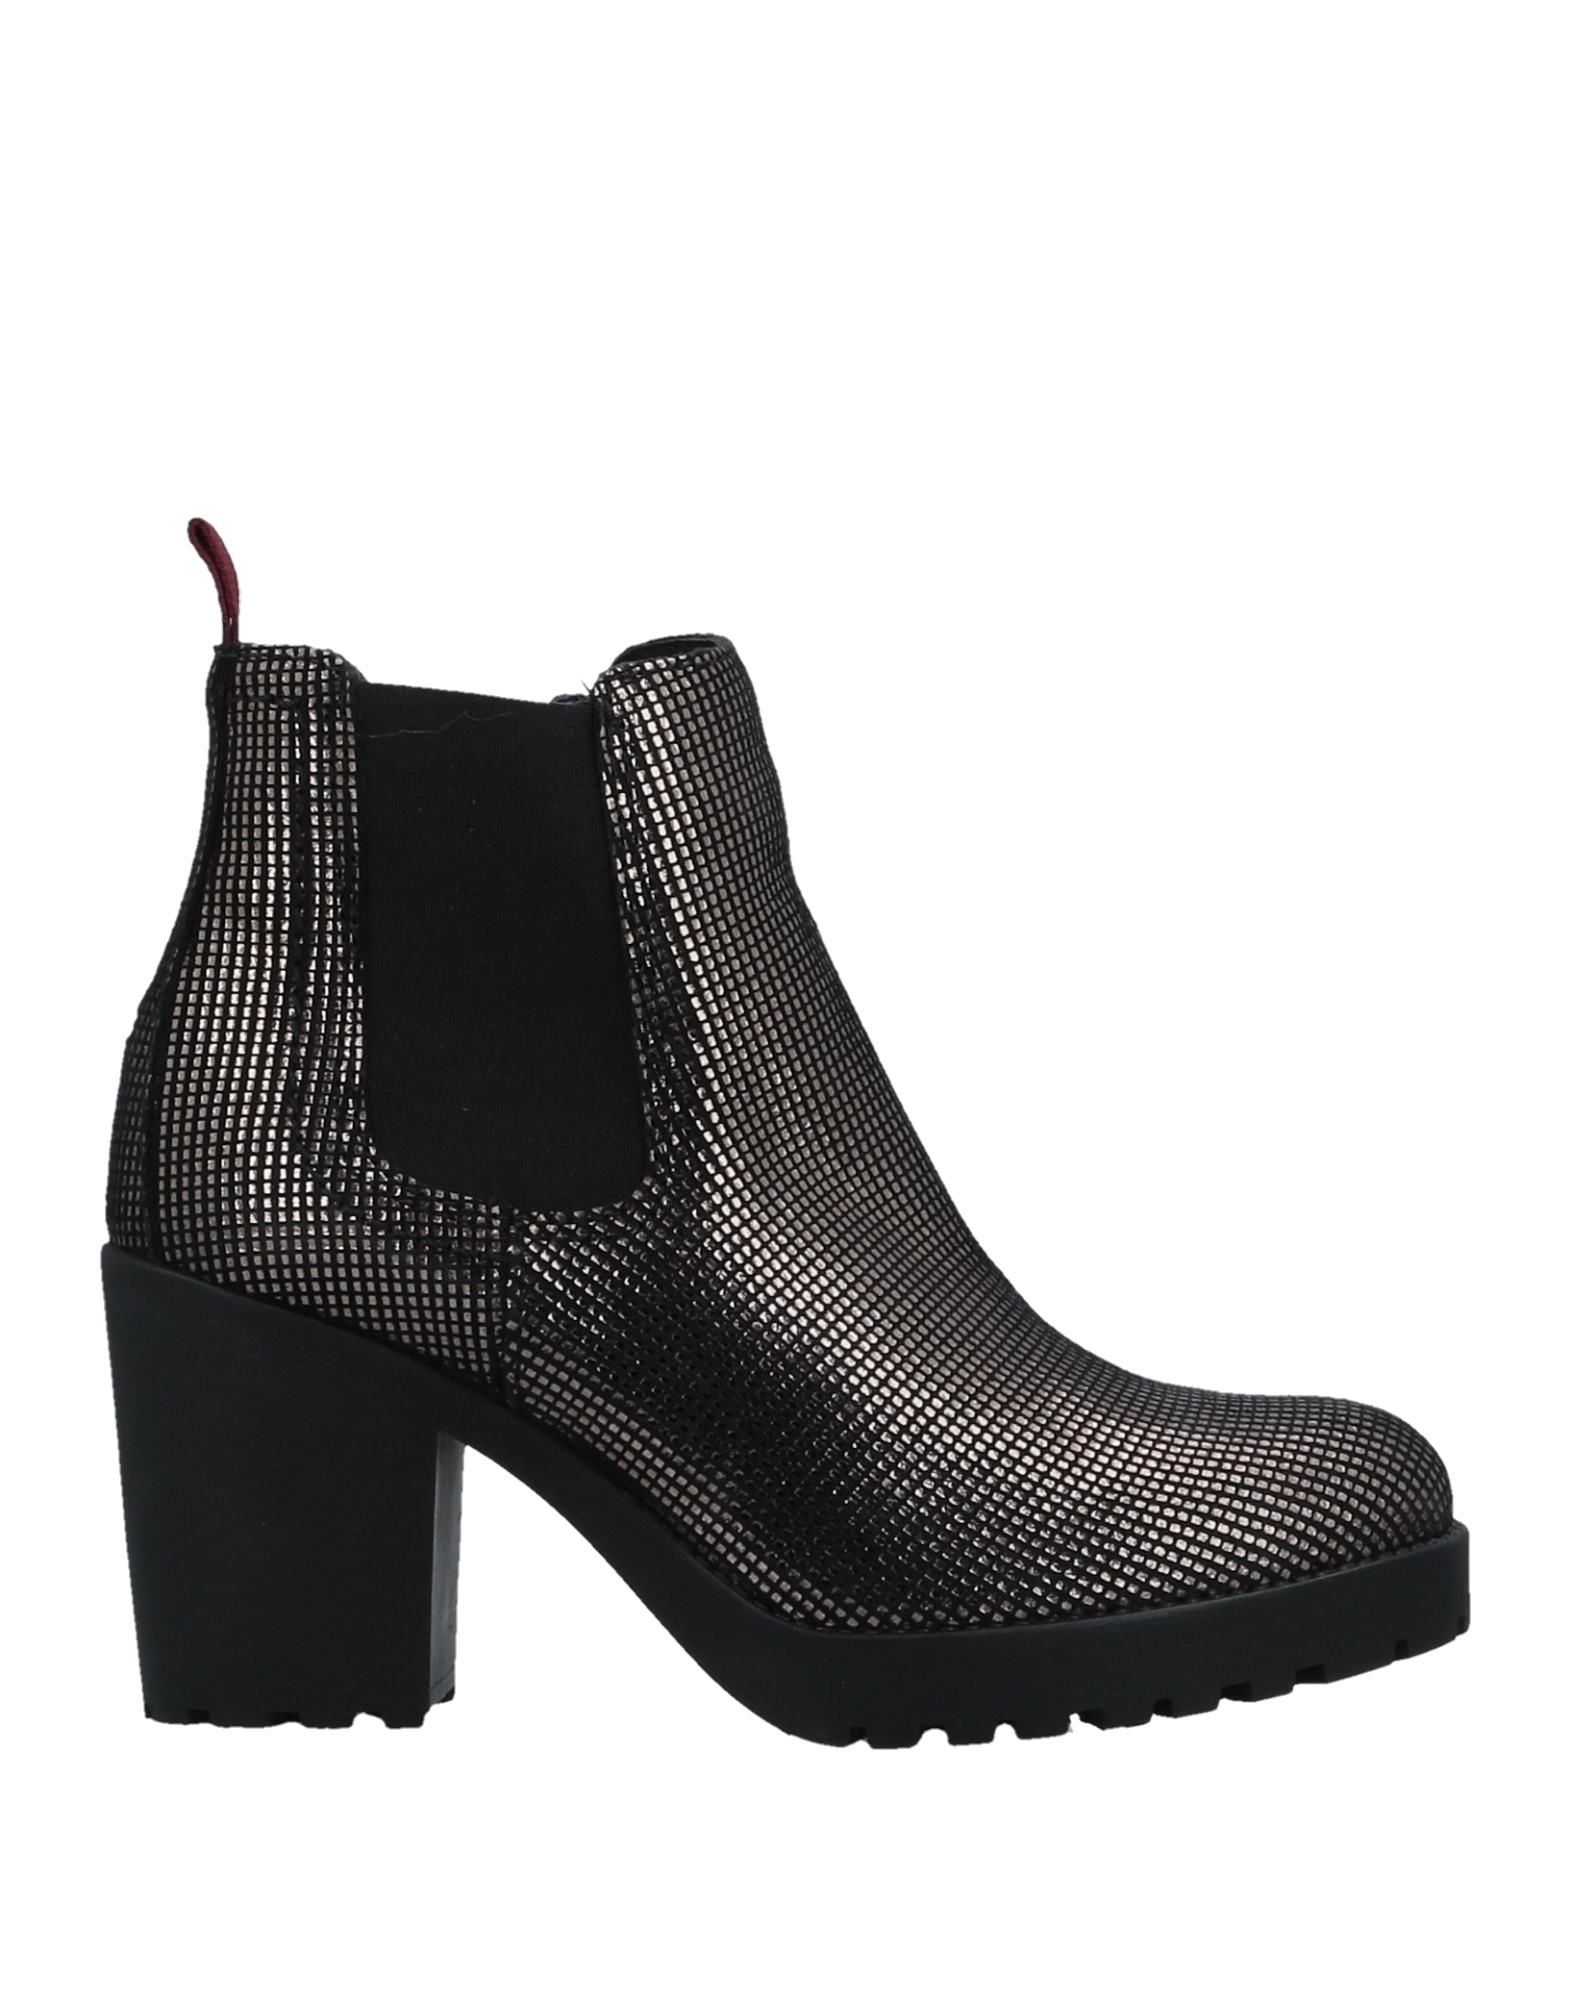 Tommy 11508239DT Jeans Stiefelette Damen  11508239DT Tommy Gute Qualität beliebte Schuhe e861b6